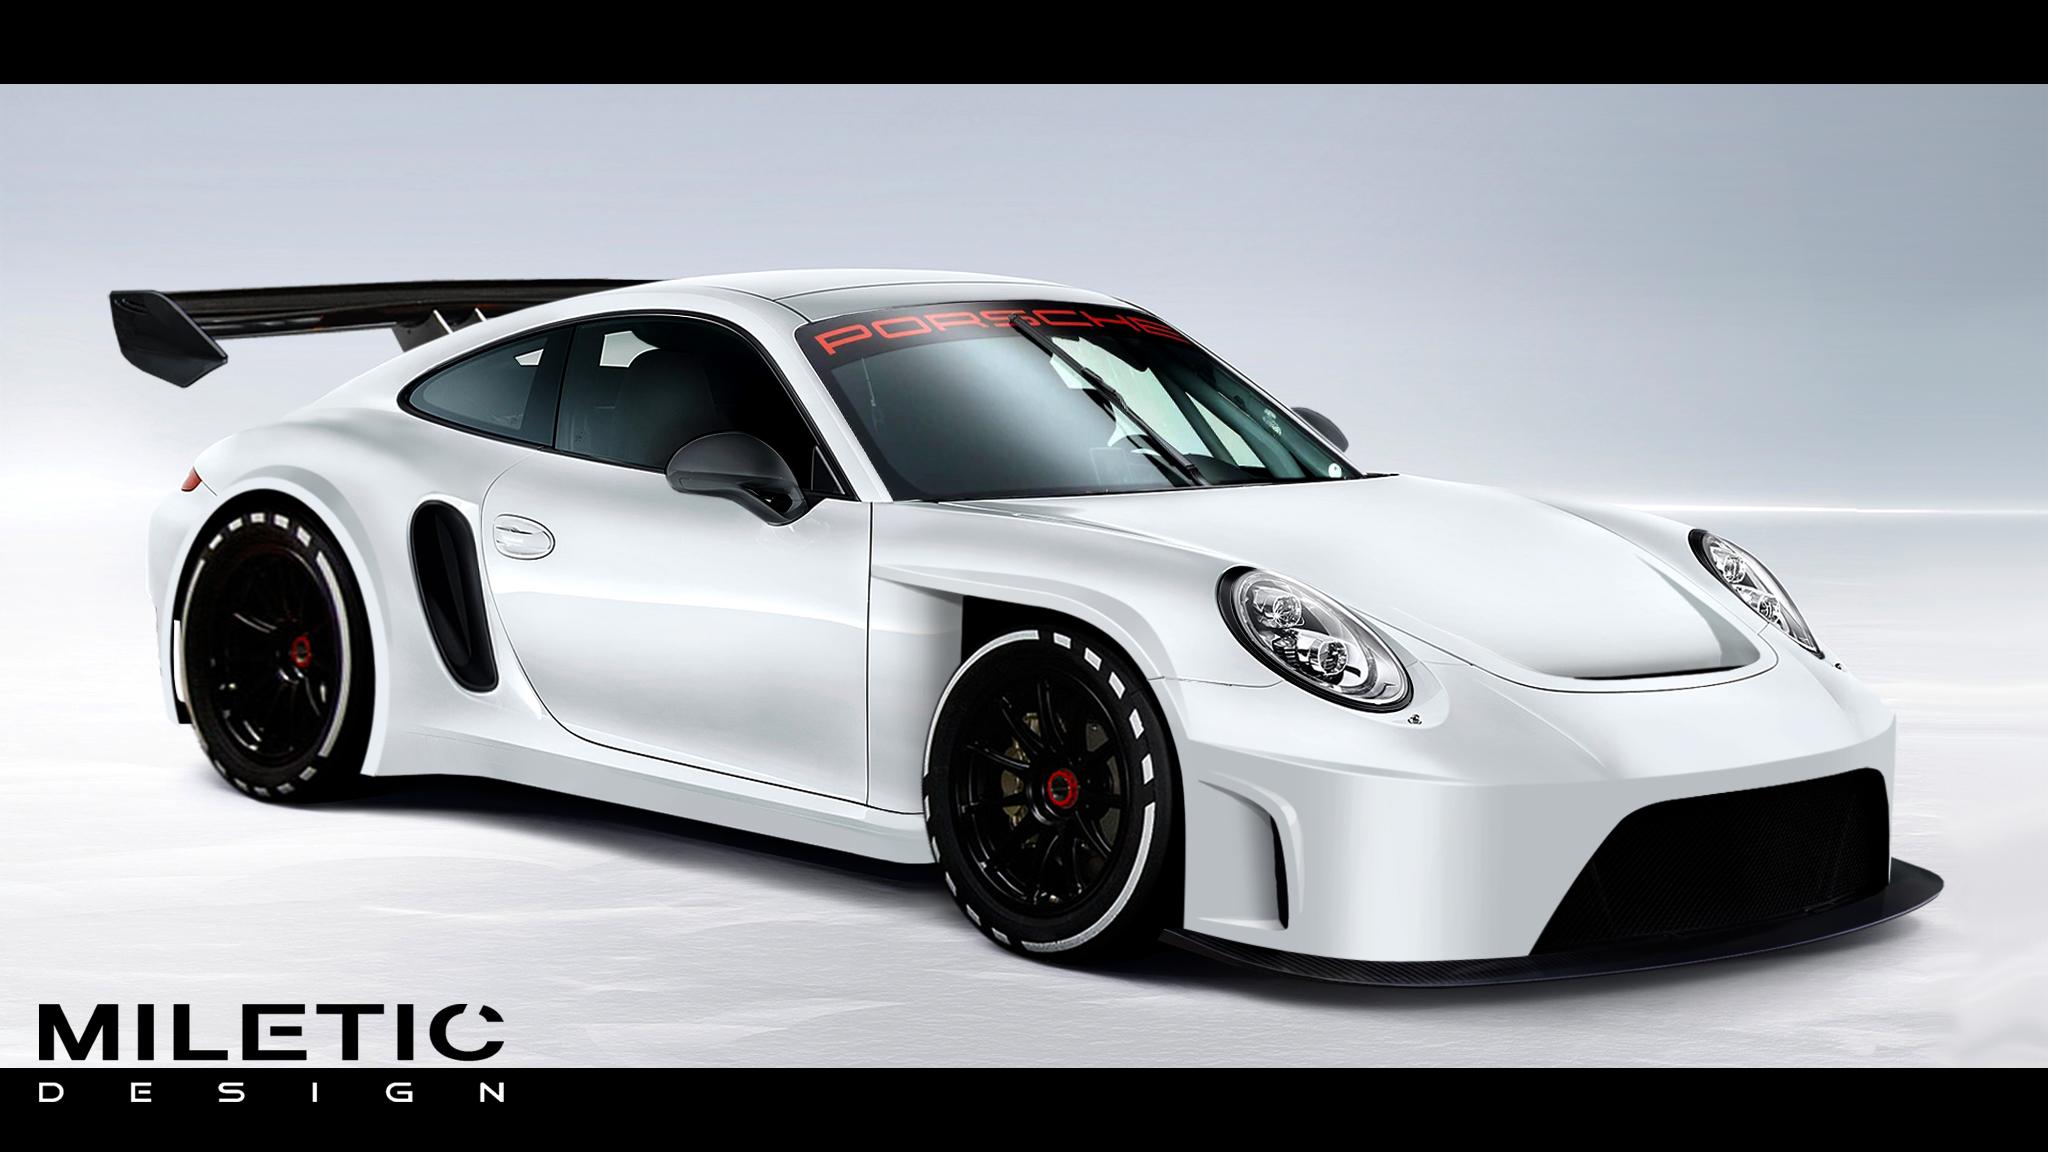 911_body_kit_design_by_morfiuss-d8cen1h Stunning Porsche 911 Gt2 Body Kit Cars Trend